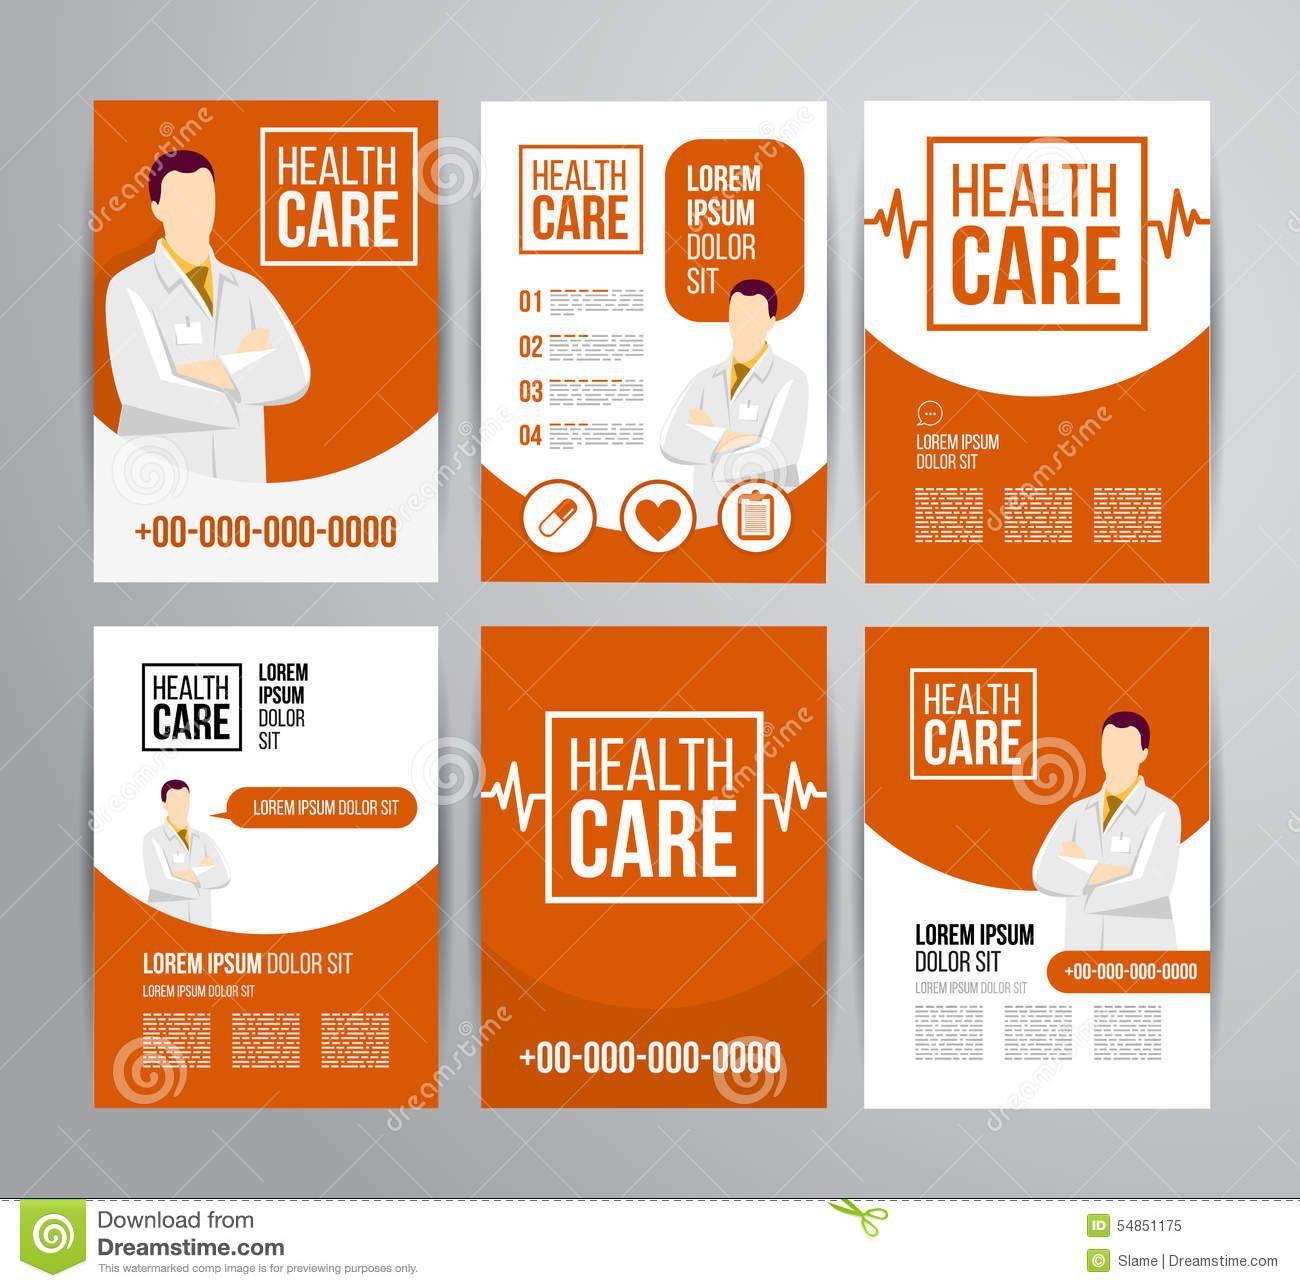 HealthcareBrochureVectorHealthCareClinicDoctorsMedical